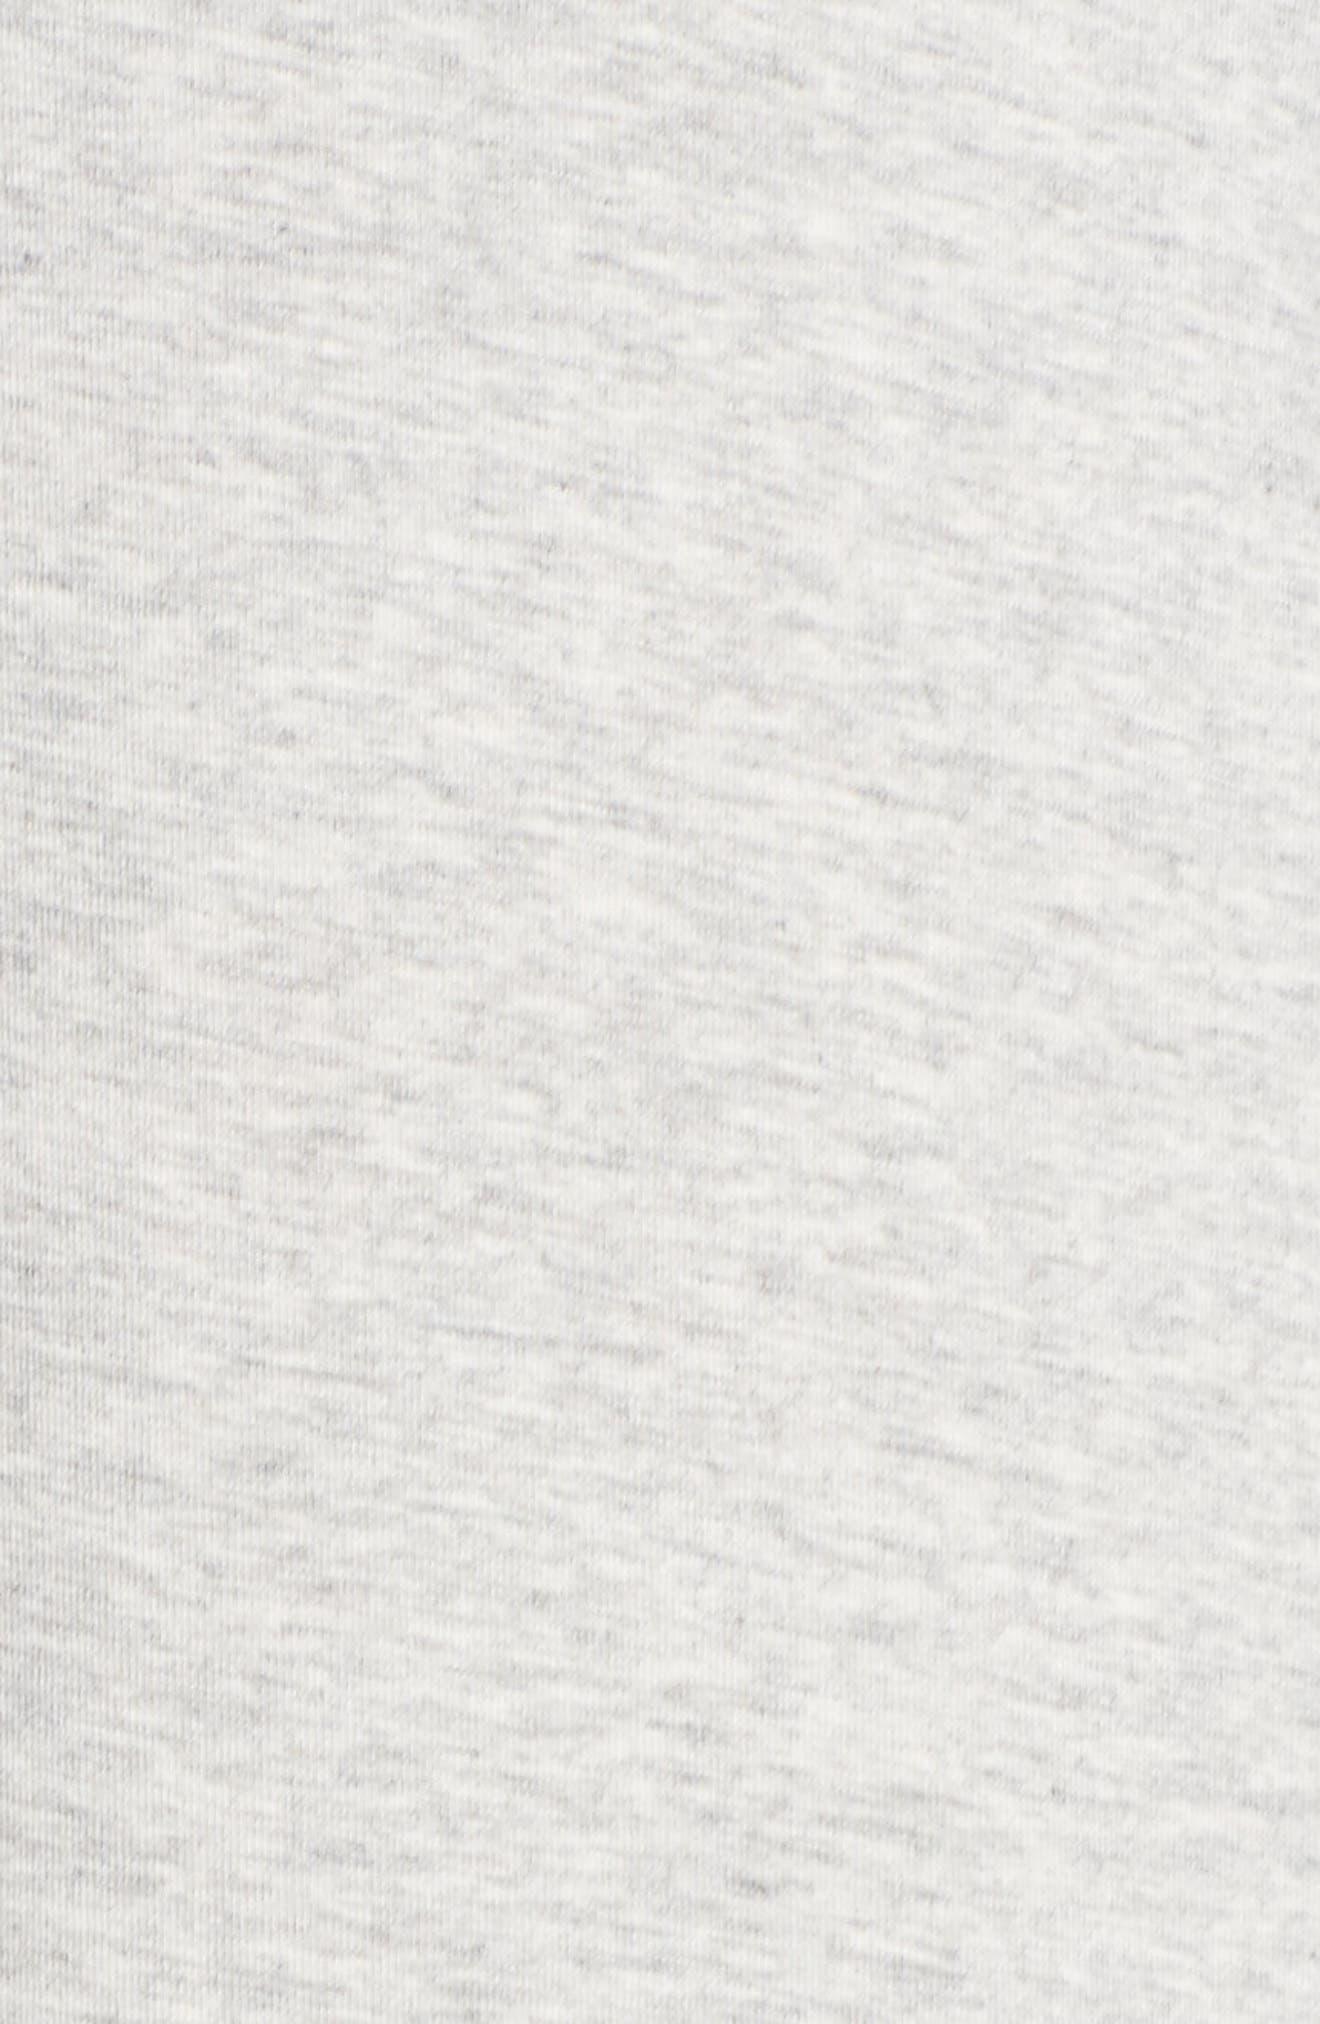 Dolman Sleeve Nightshirt,                             Alternate thumbnail 5, color,                             Grey Pearl Heather